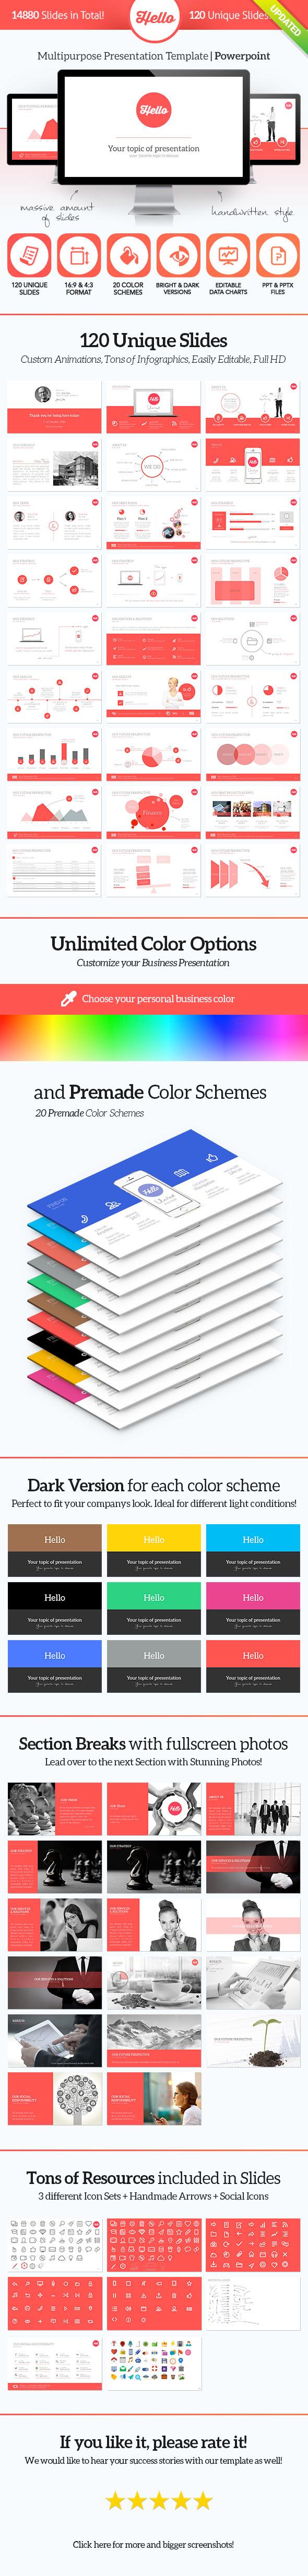 Hello PowerPoint - Multipurpose Presentation - Powerpoint Templates Presentation Templates